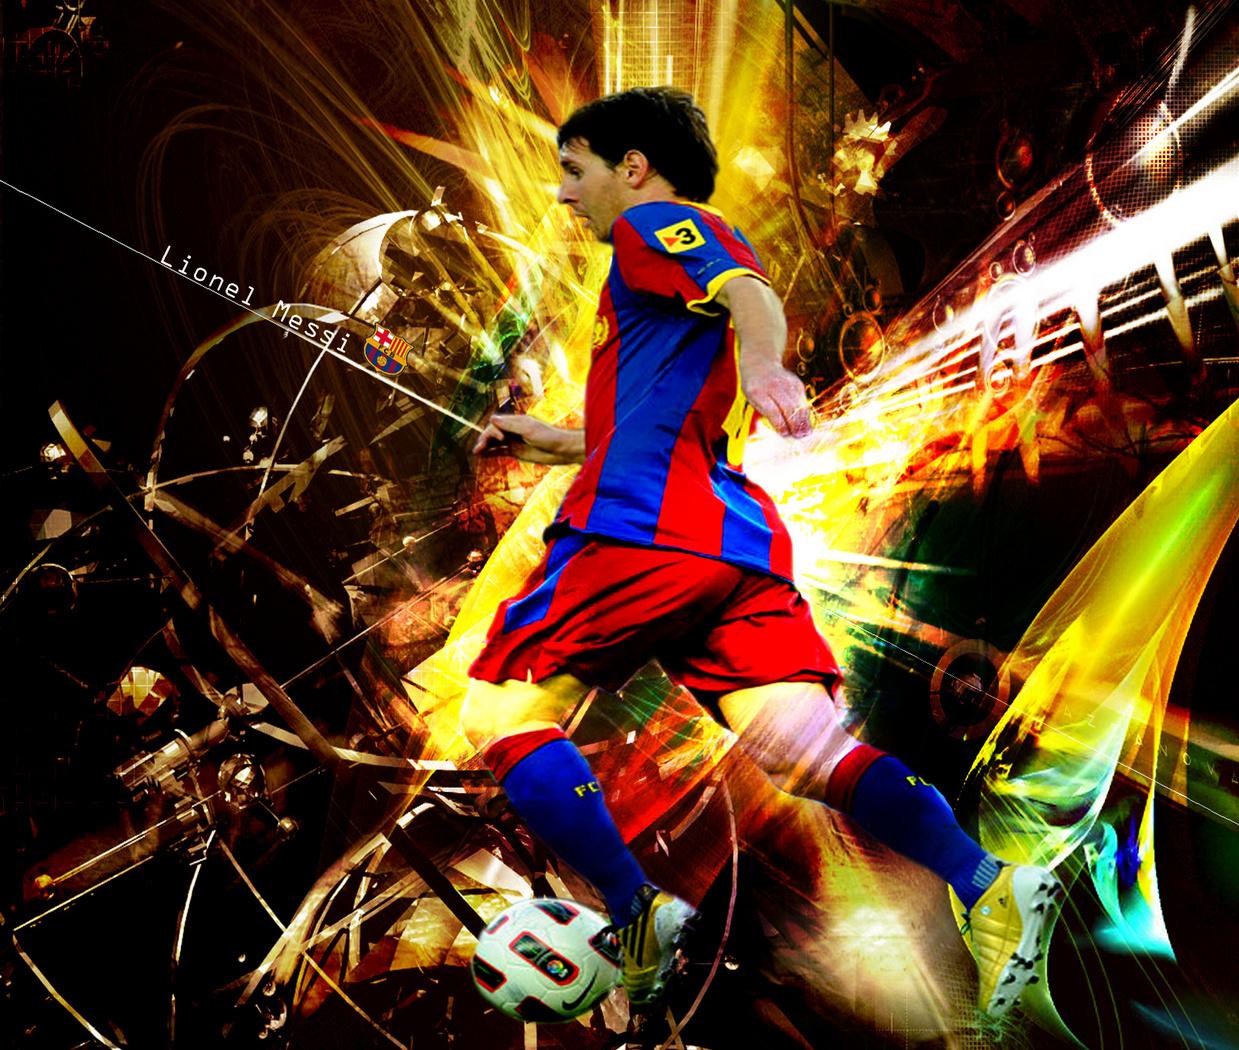 http://1.bp.blogspot.com/-KehYlYbUXhI/UDx9jSZ7cBI/AAAAAAAAAkM/lxB3_uCDkeo/s1600/Lionel+Messi+HD+Wallpaper+2012-2013+14.jpg